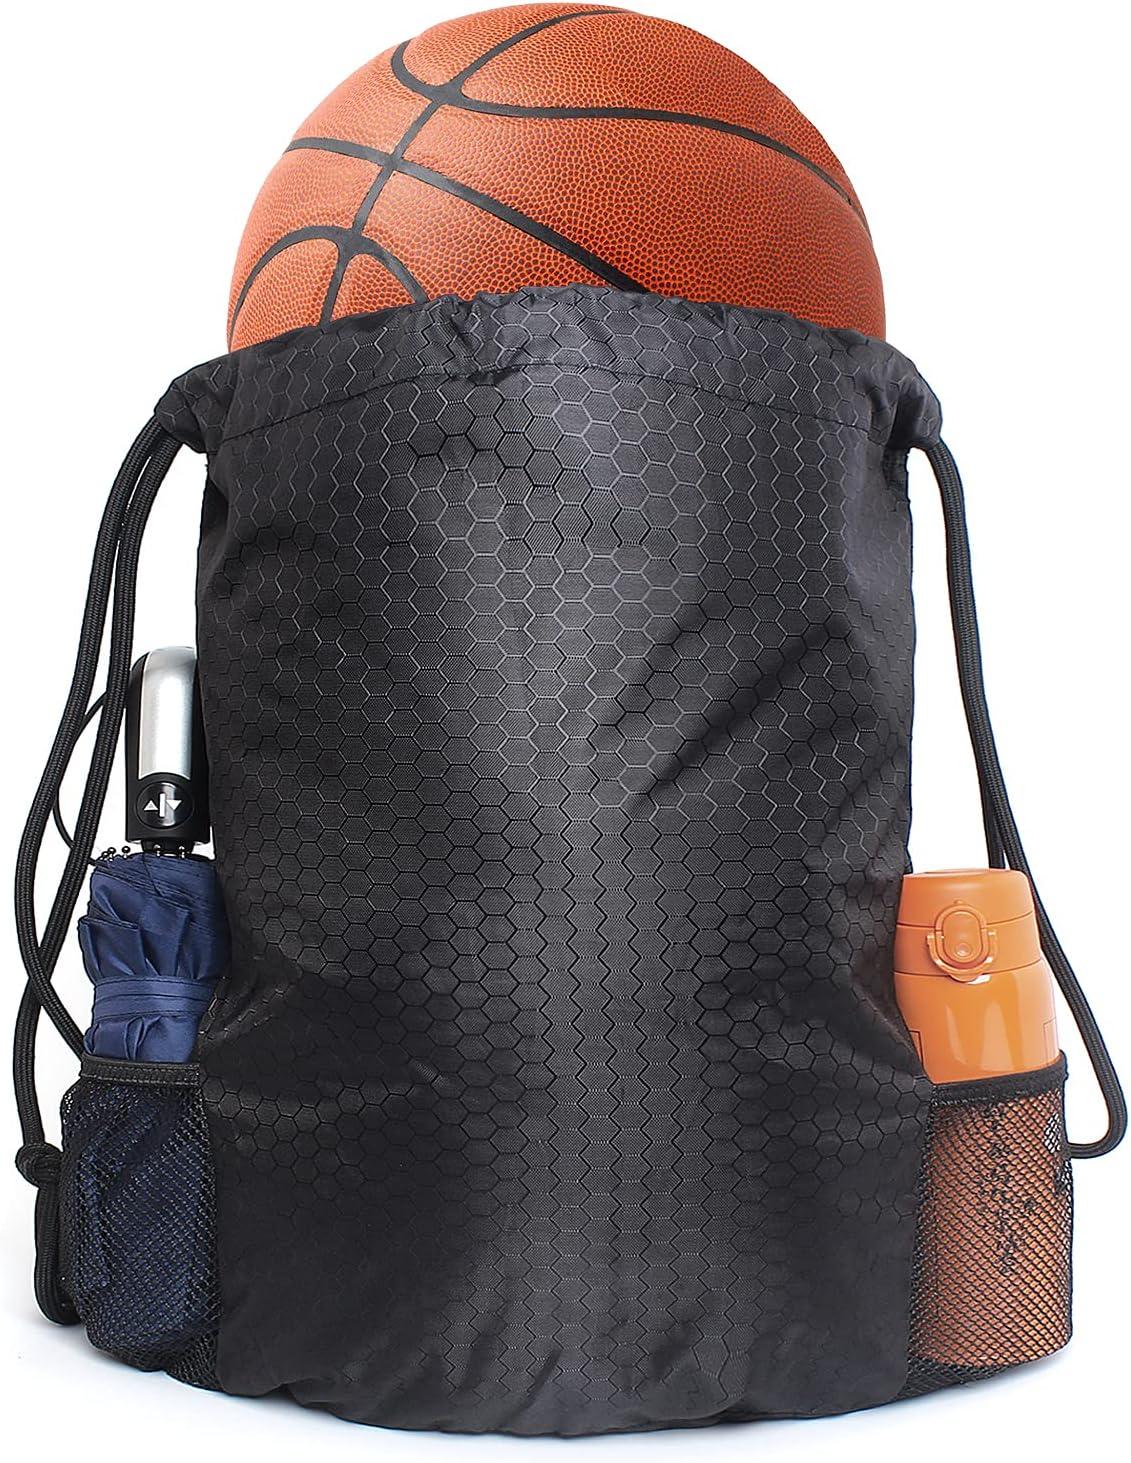 Pixel price Panda Drawstring Louisville-Jefferson County Mall Backpack Water Bag Resistant String Sport